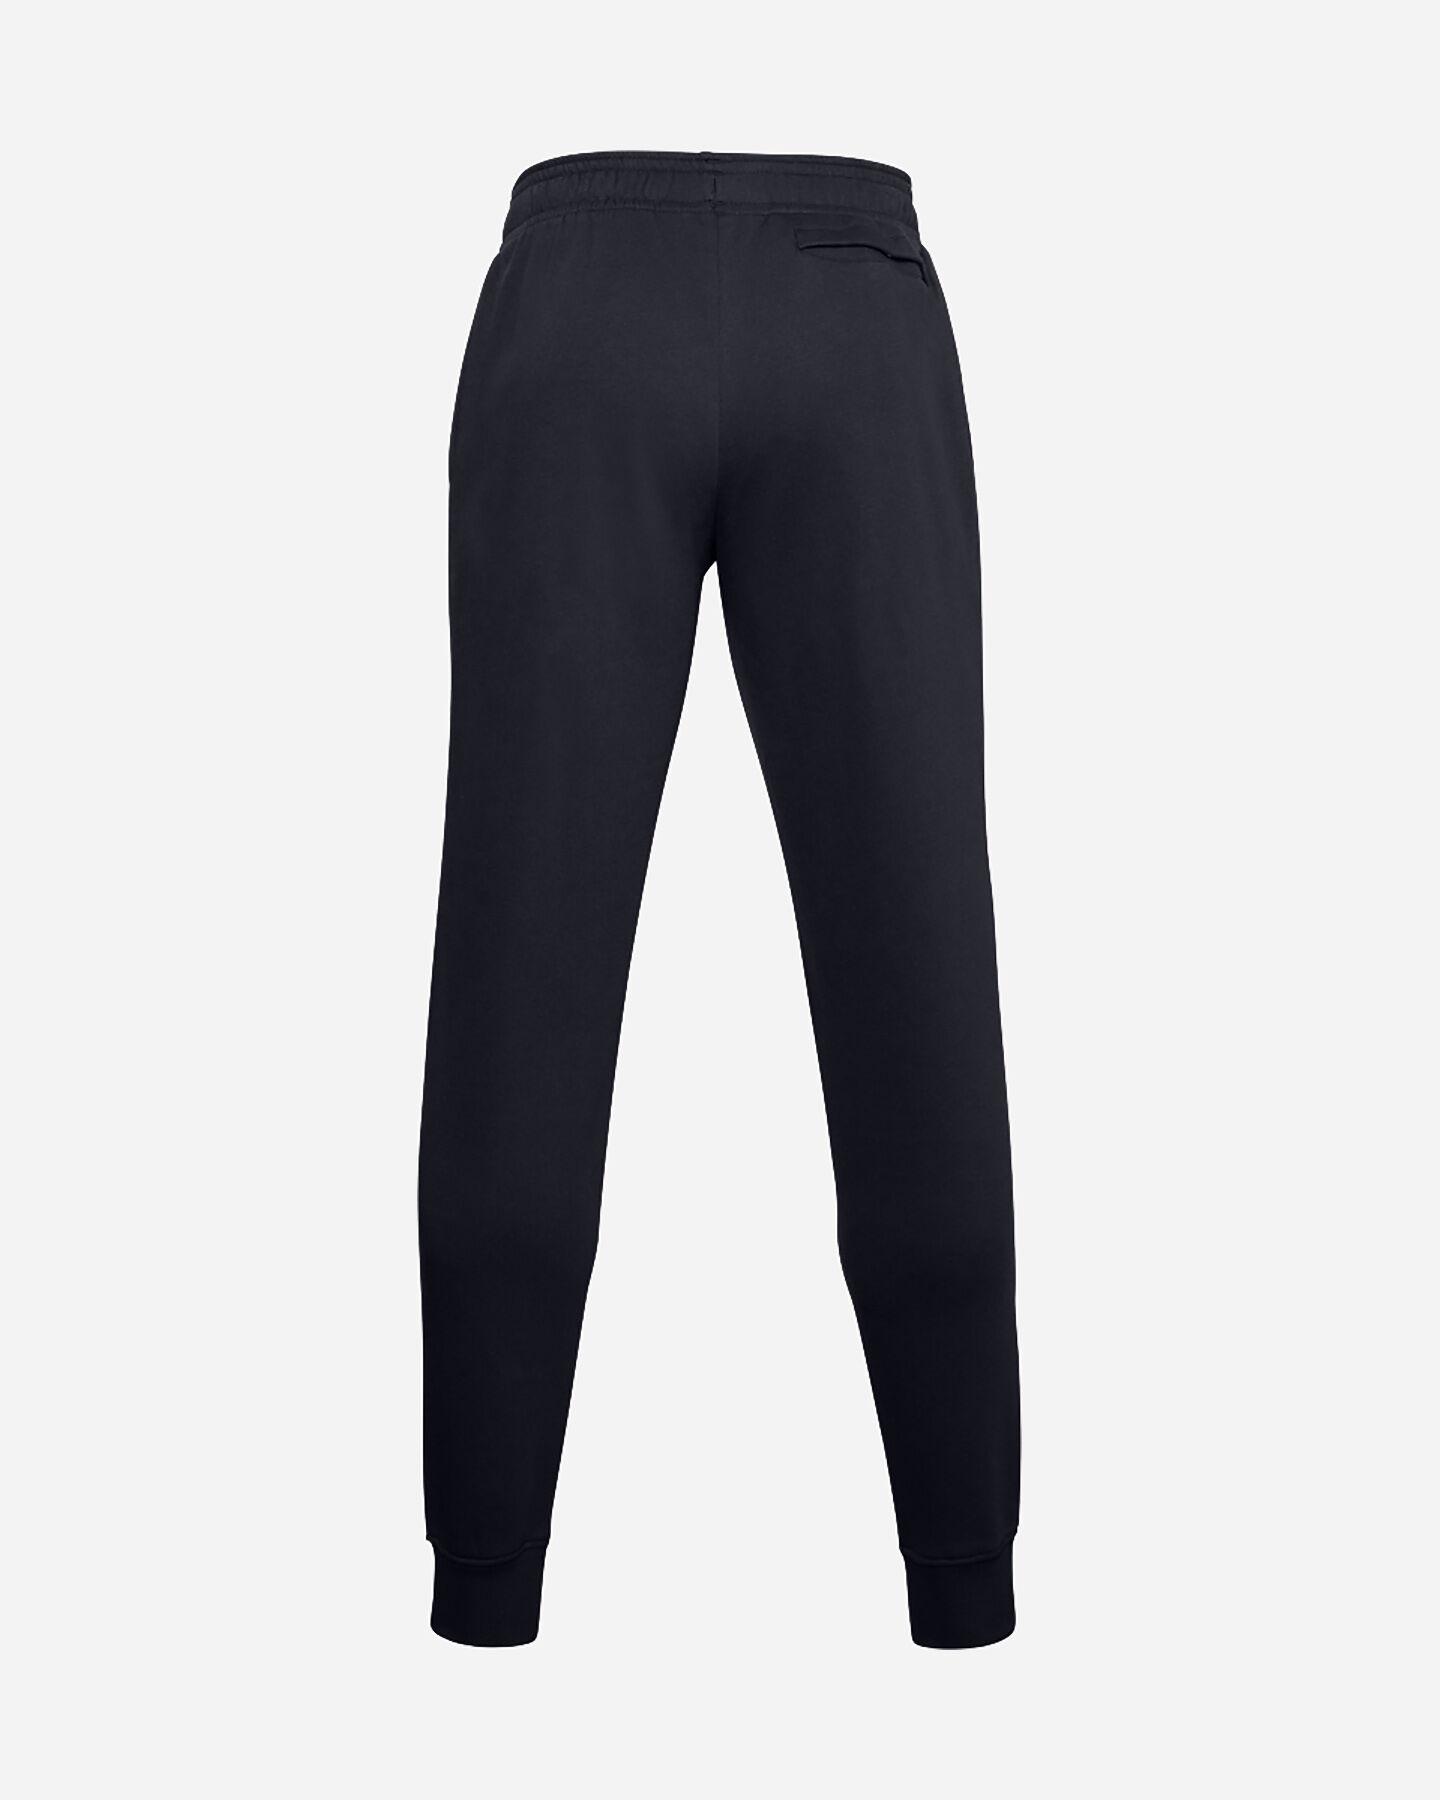 Pantalone UNDER ARMOUR RIVAL M S5229606 scatto 1